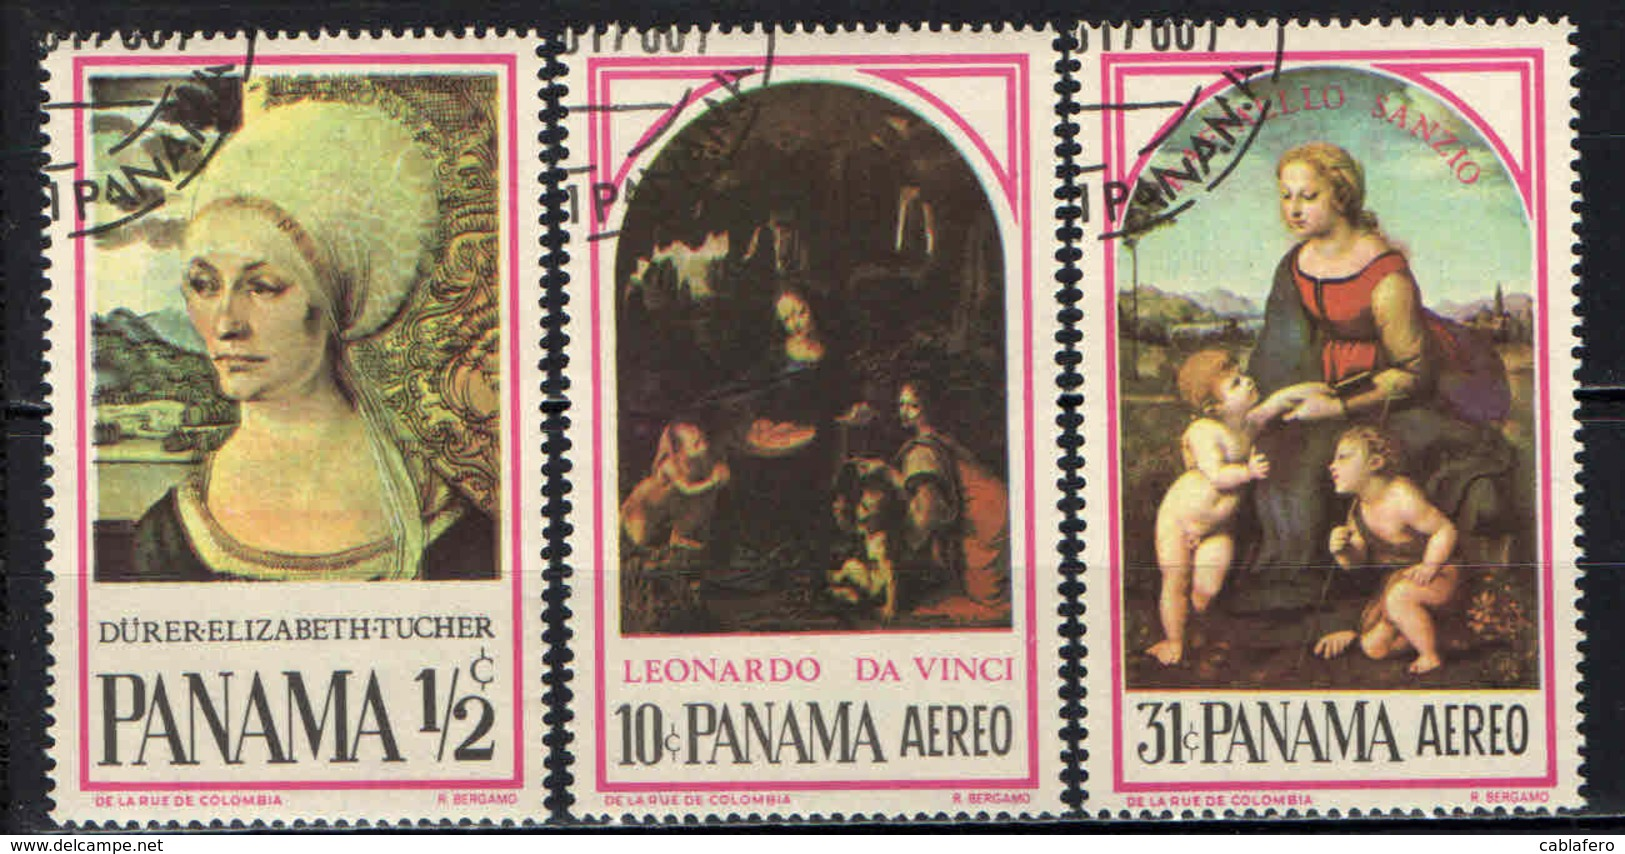 PANAMA - 1966 - DIPINTI E PITTORI FAMOSI: DURER, LEONARDO DA VINCI, RAFFAELLO SANZIO - USATI - Panama